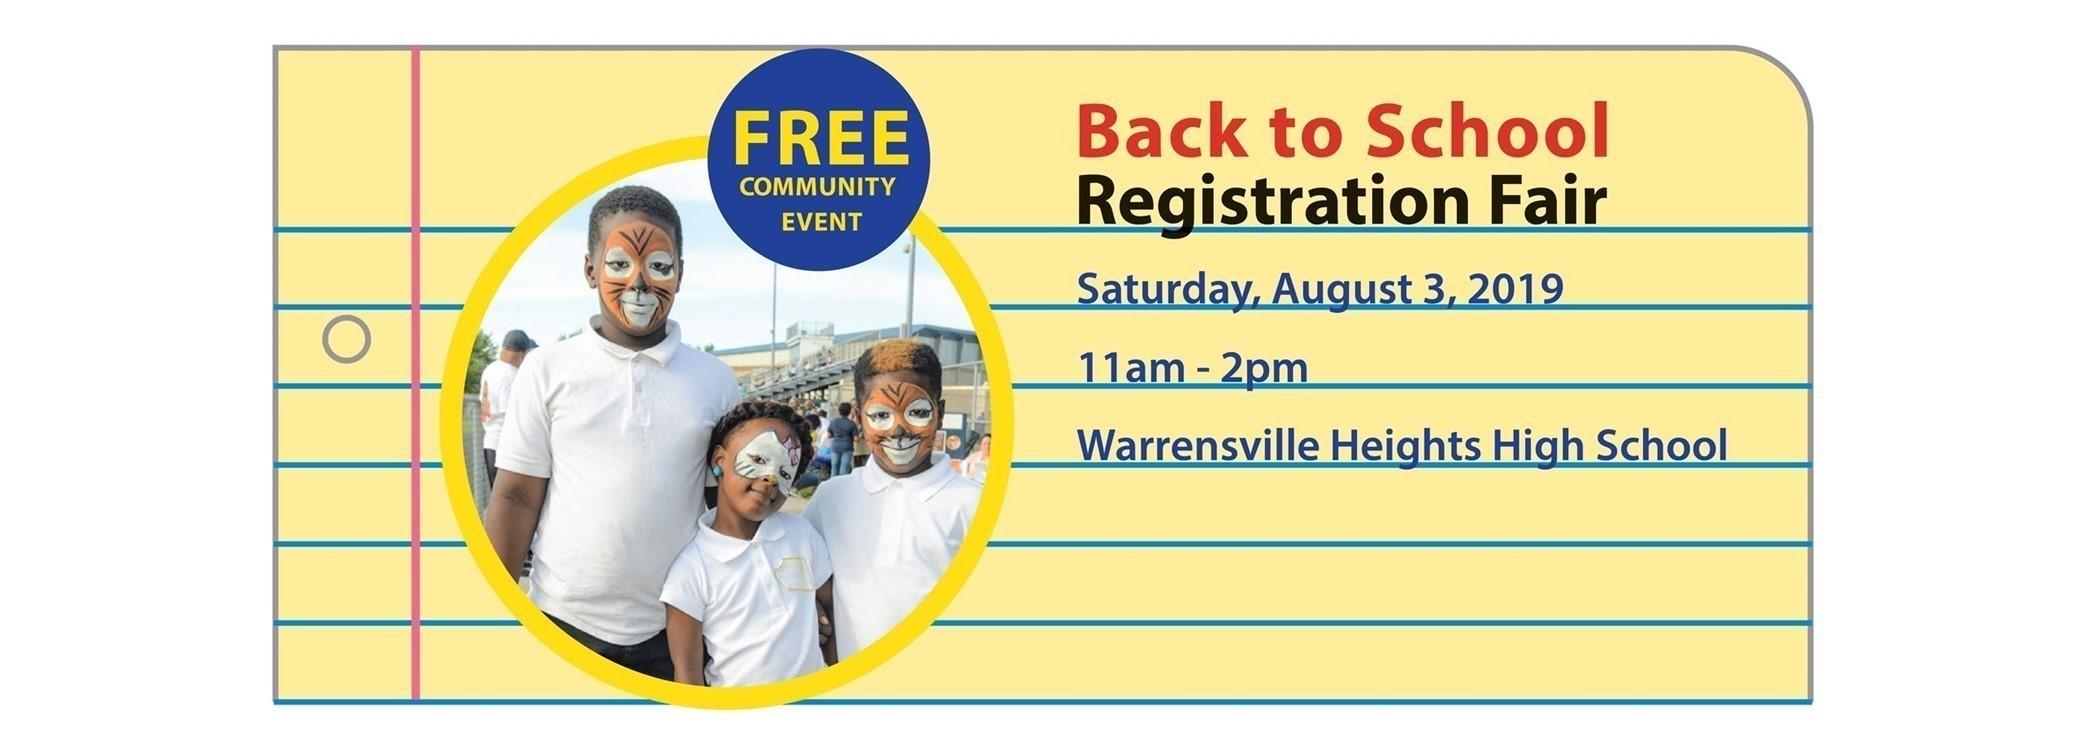 Back to School Registration Fair